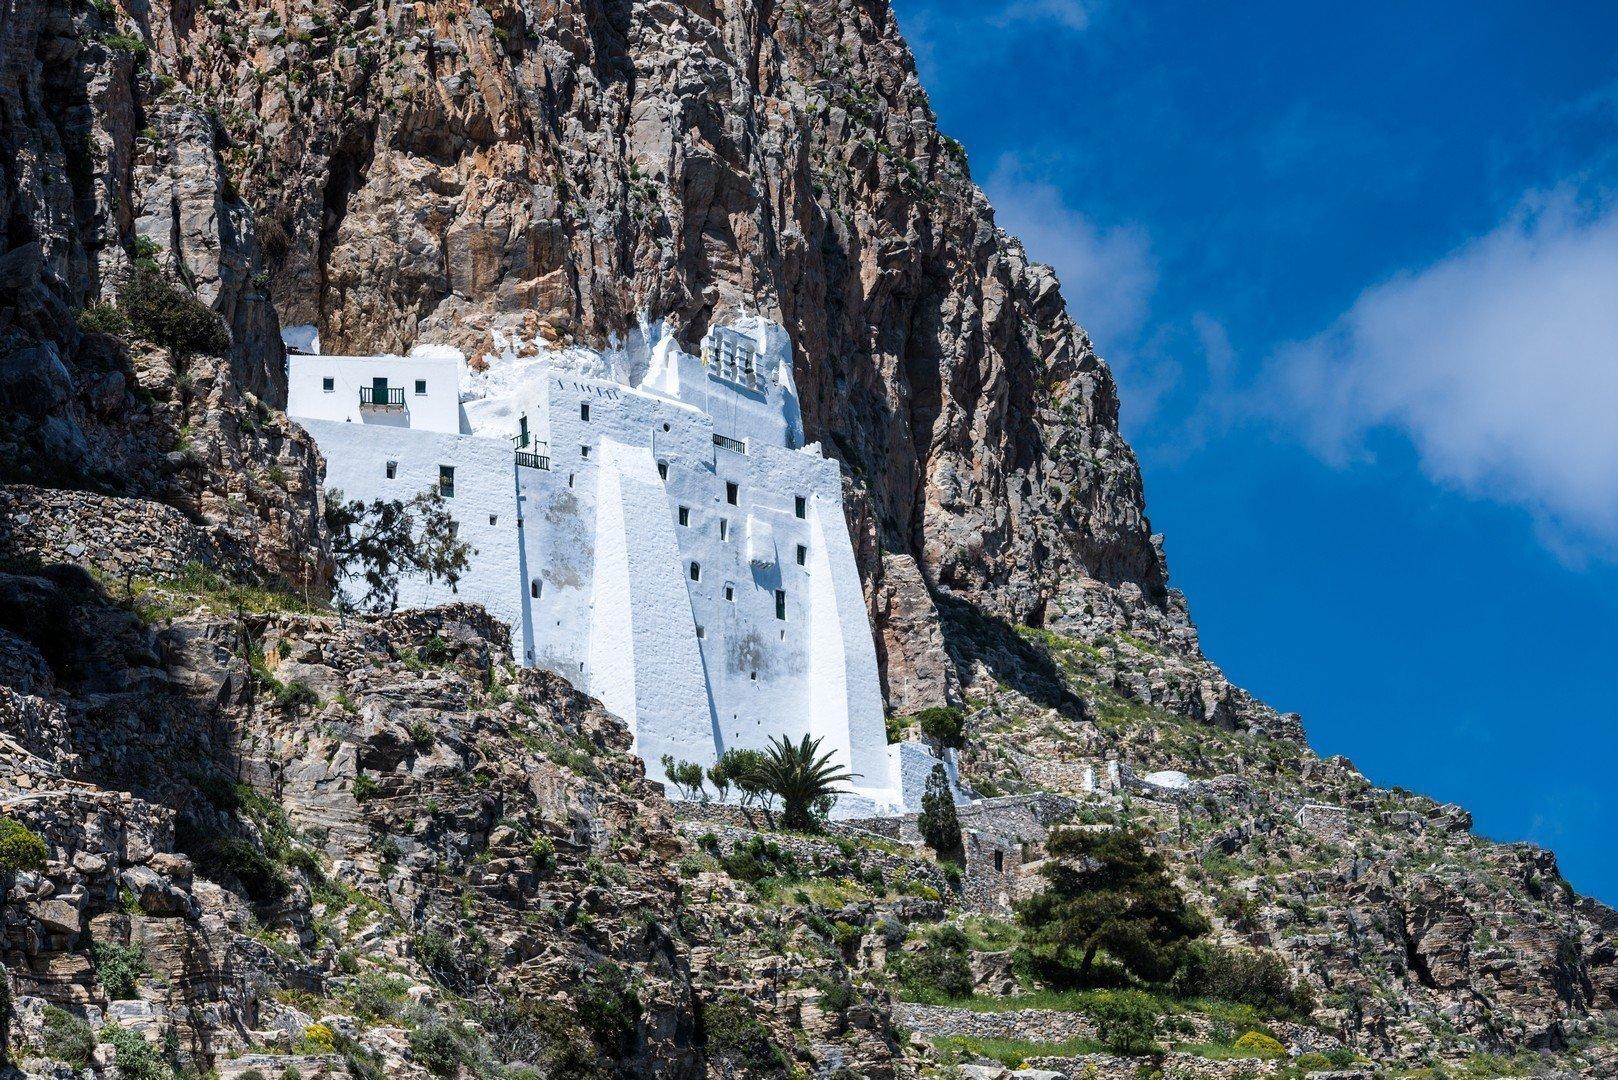 Chozoviotissa monastery, Amorgos island, Greece shutterstock_1374233903